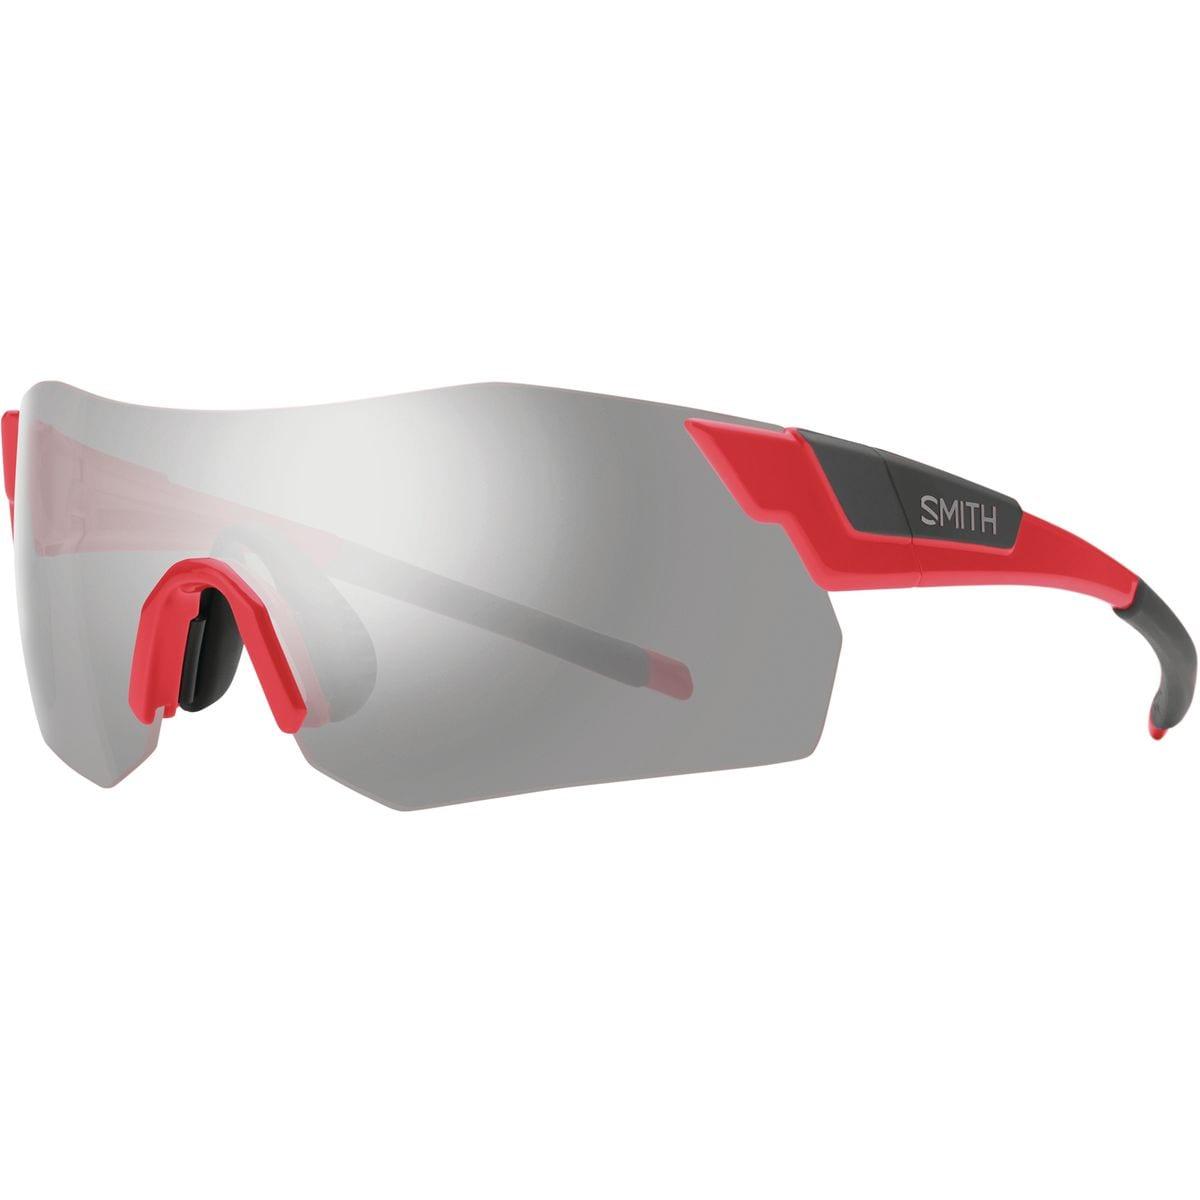 Smith Pivlock Arena Max ChromaPop Sunglasses - Men's